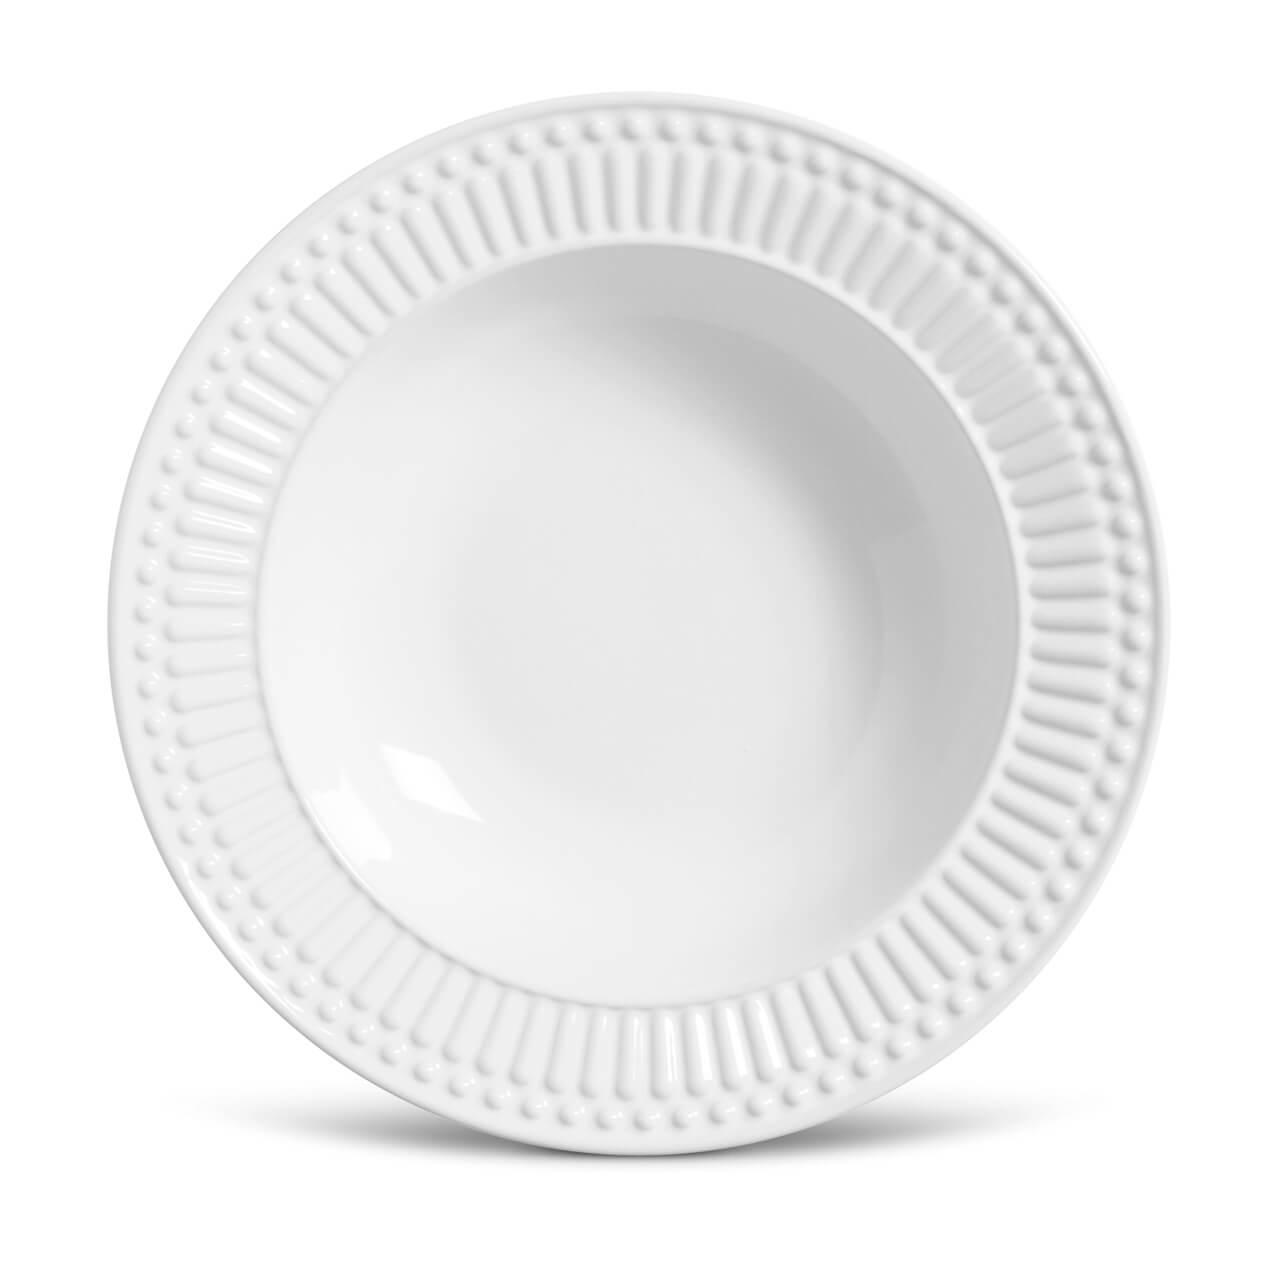 Aparelho de Jantar 30 Peças Branco Porto Brasil Roma